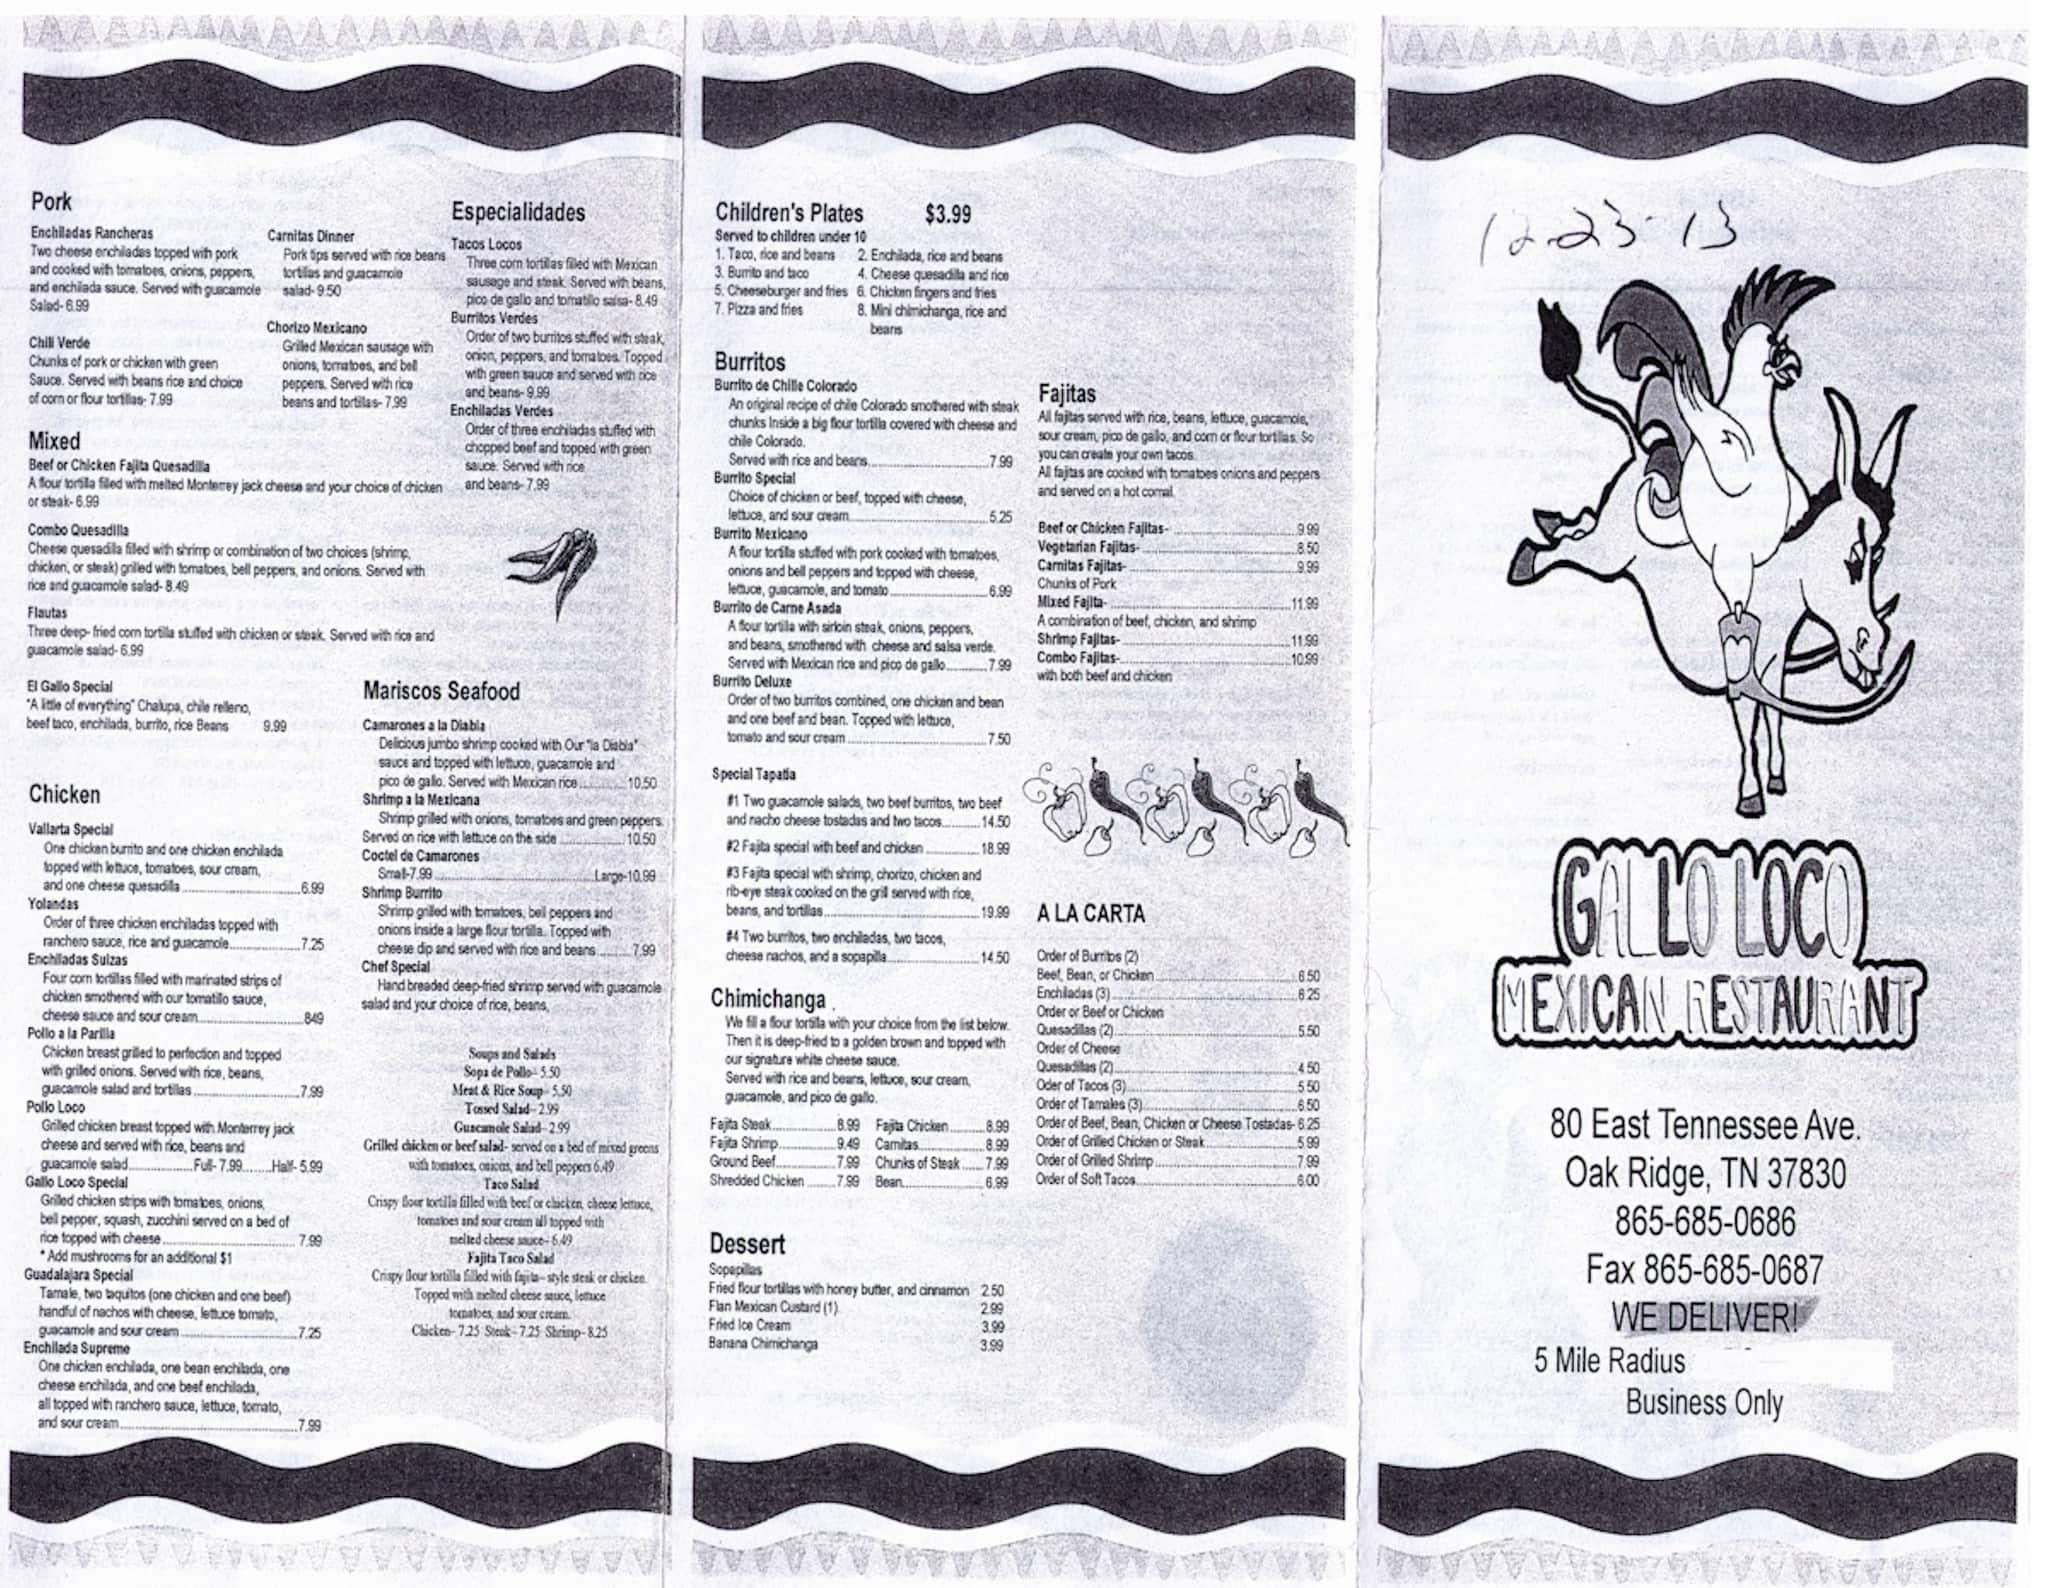 Gallo Loco Mexican Restaurant Oak Ridge Menu